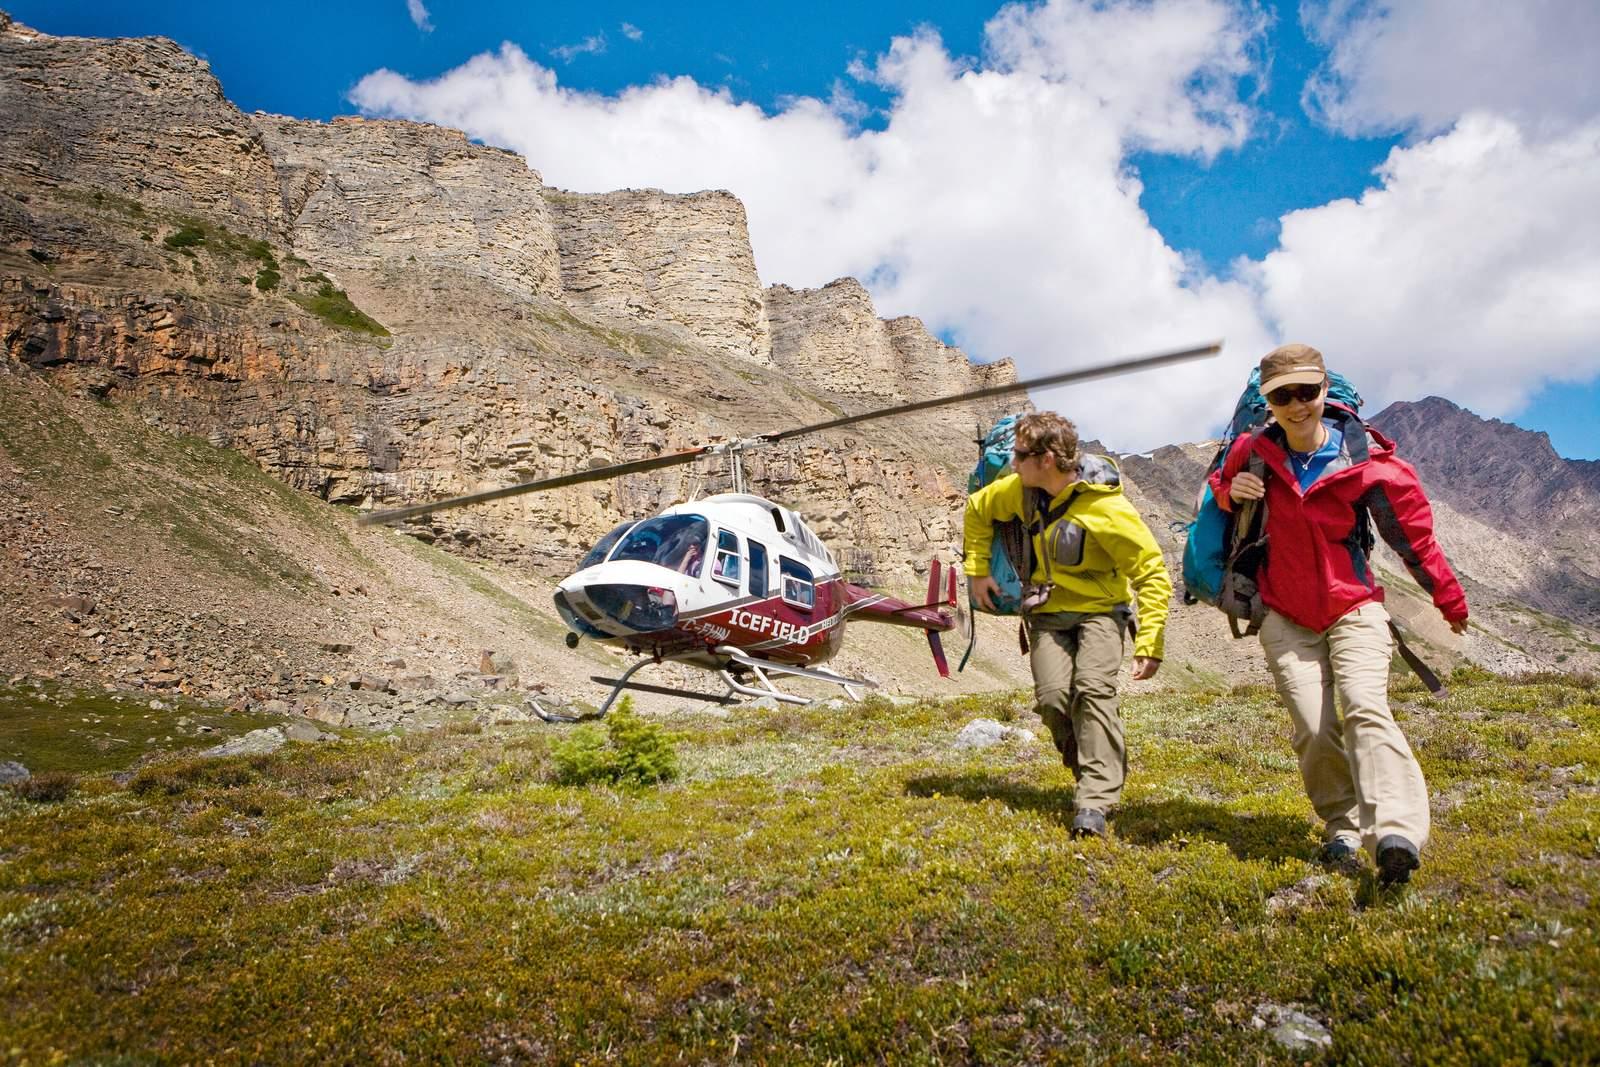 Heli hiking in Banff National Park, Alberta